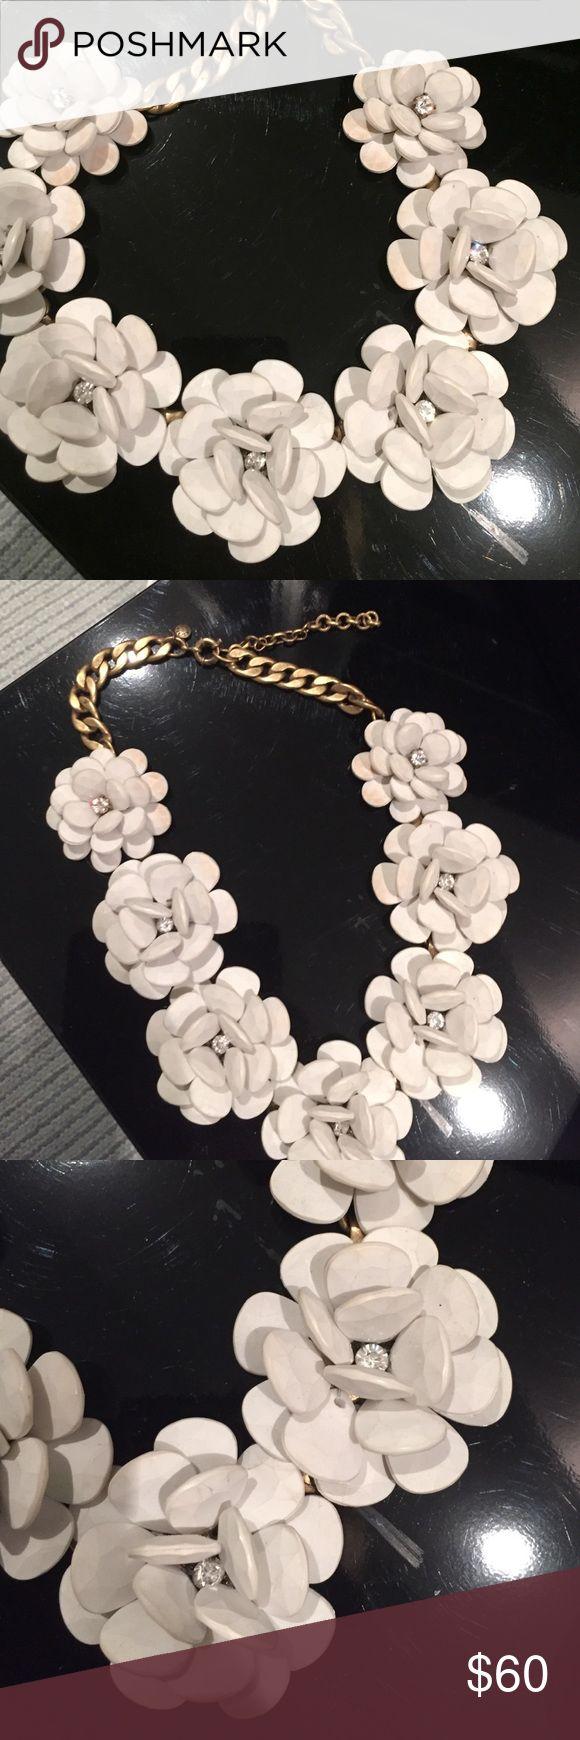 J crew white flower necklace White flower j crew necklace Jewelry Necklaces